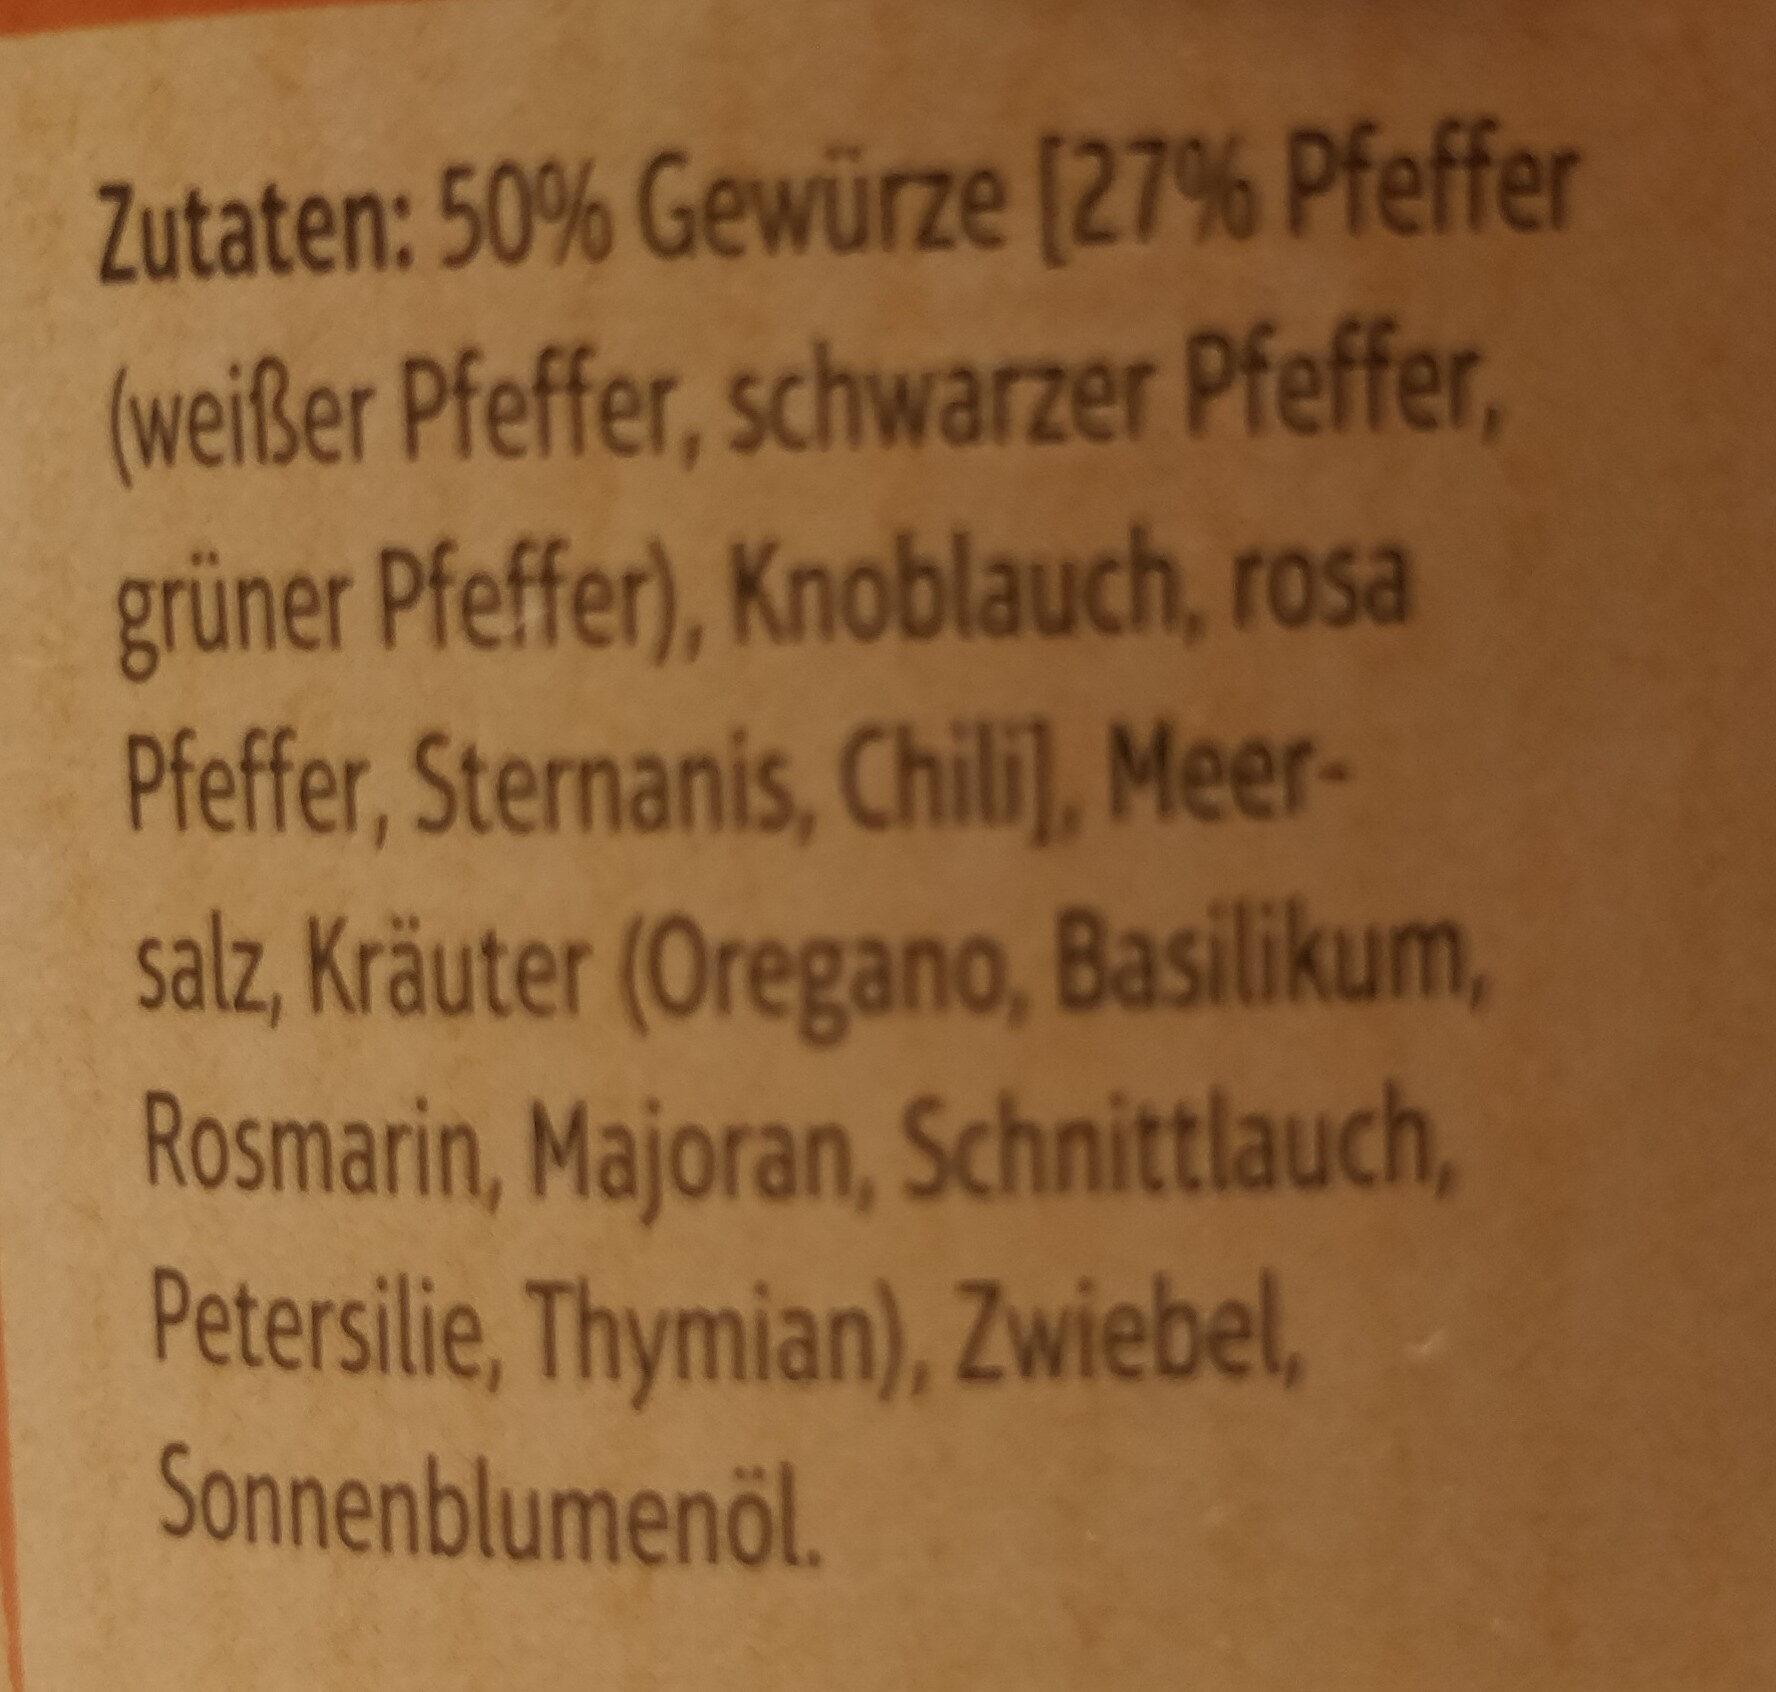 Gewürz-Pfeffer - Zutaten - de